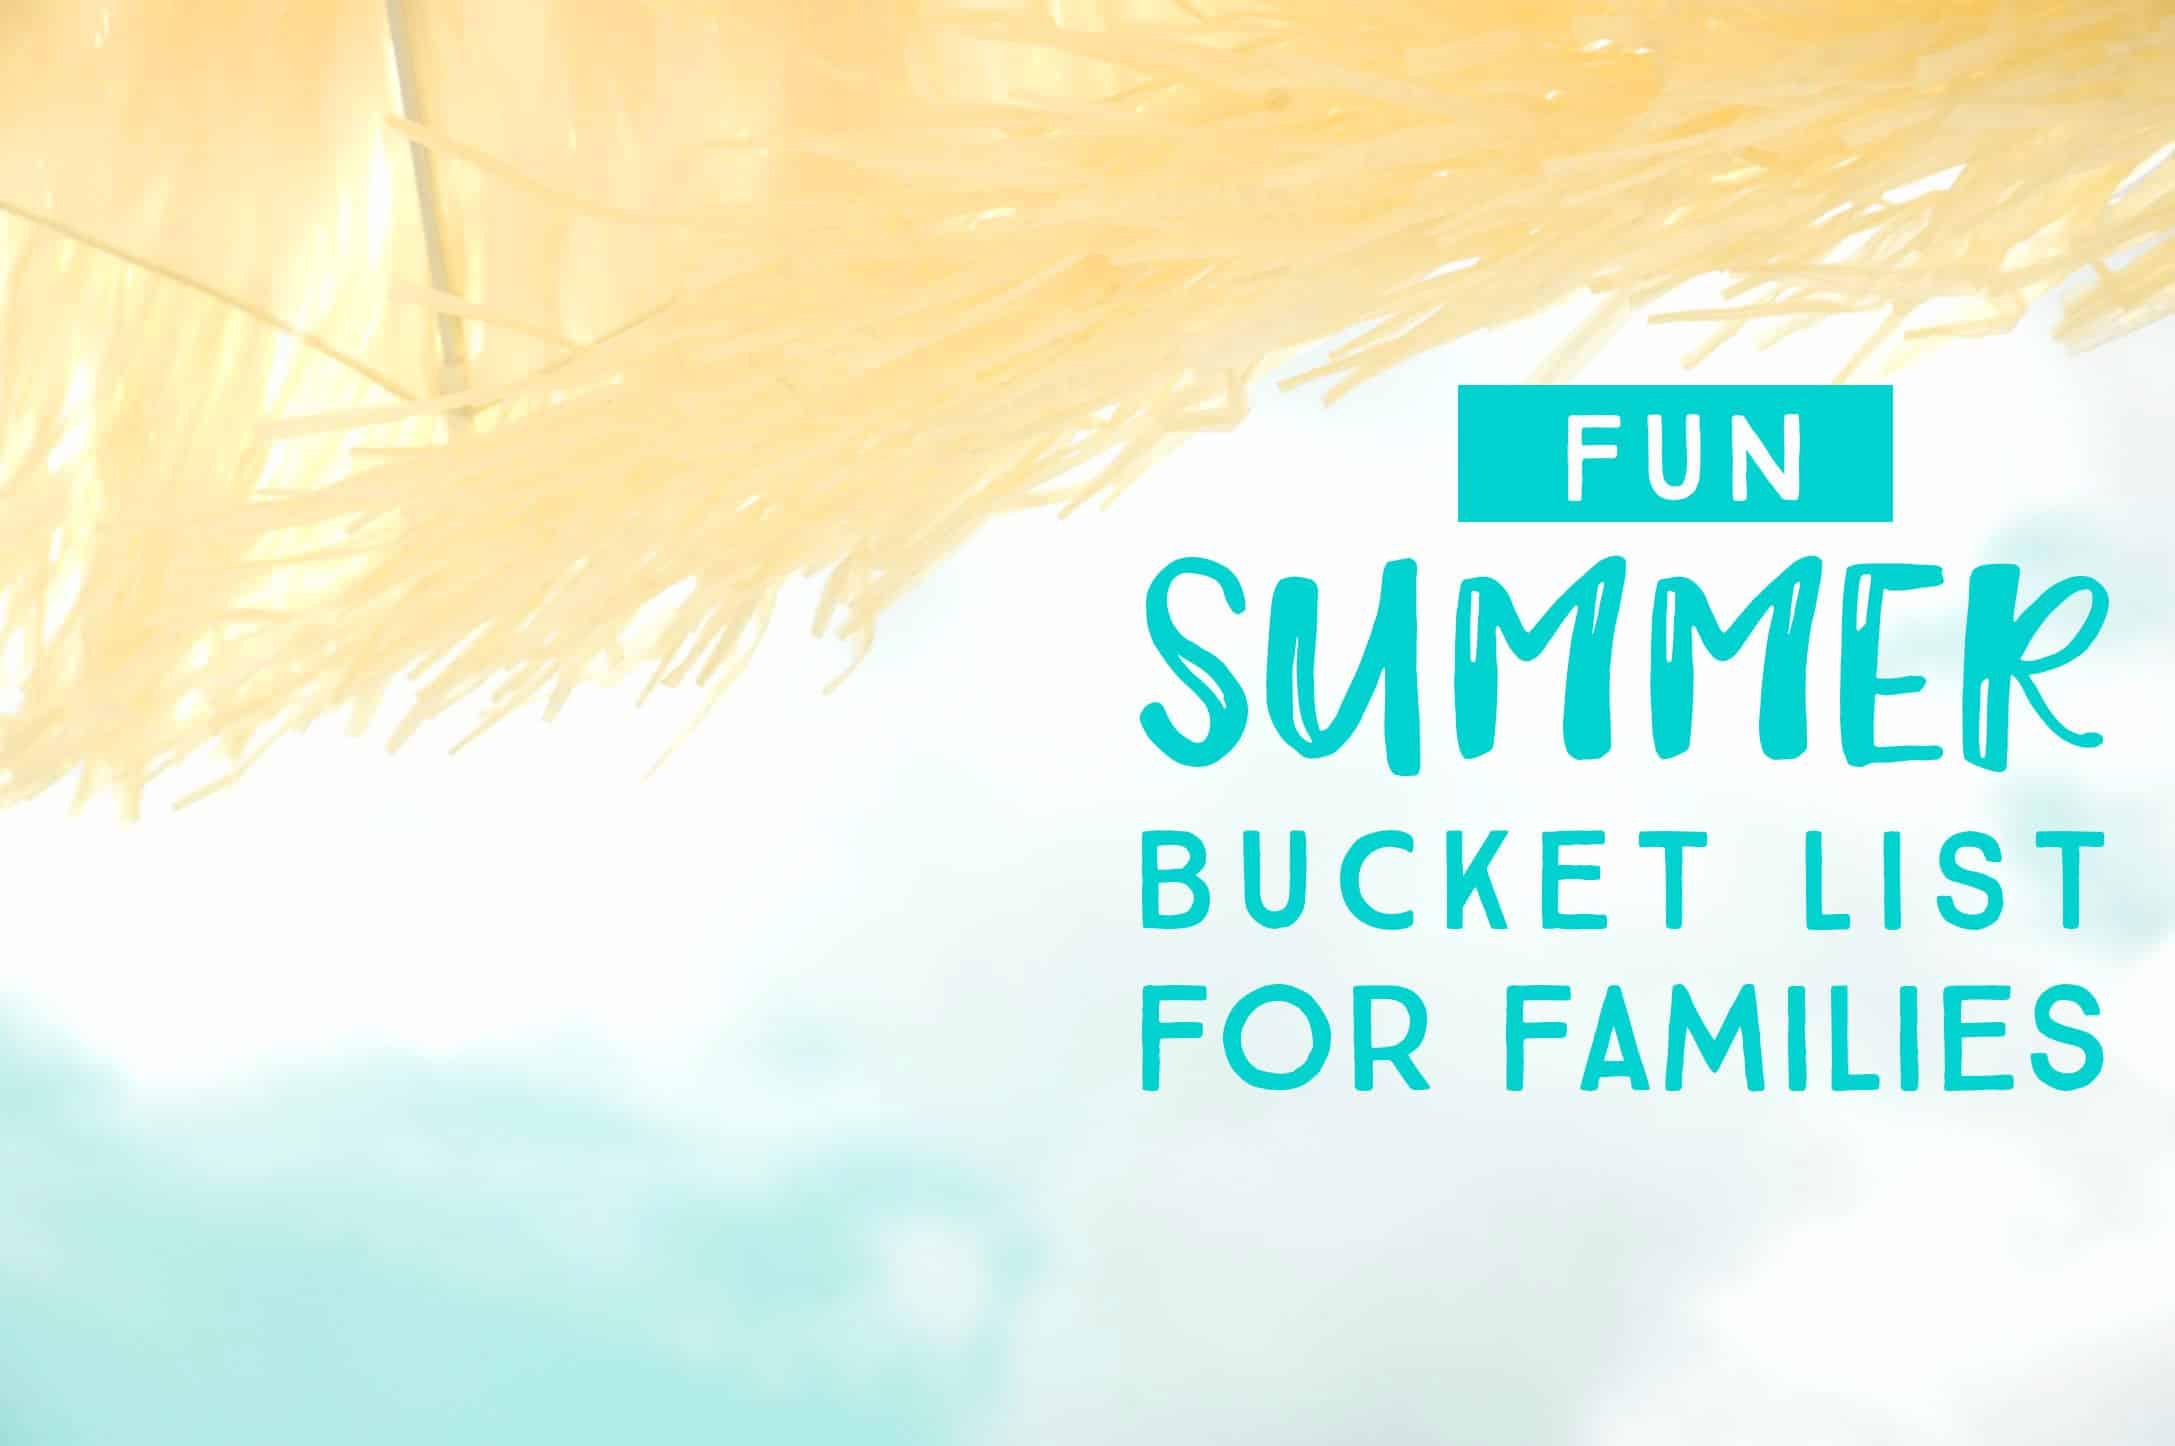 100 Fun Summer Bucket list ideas for families